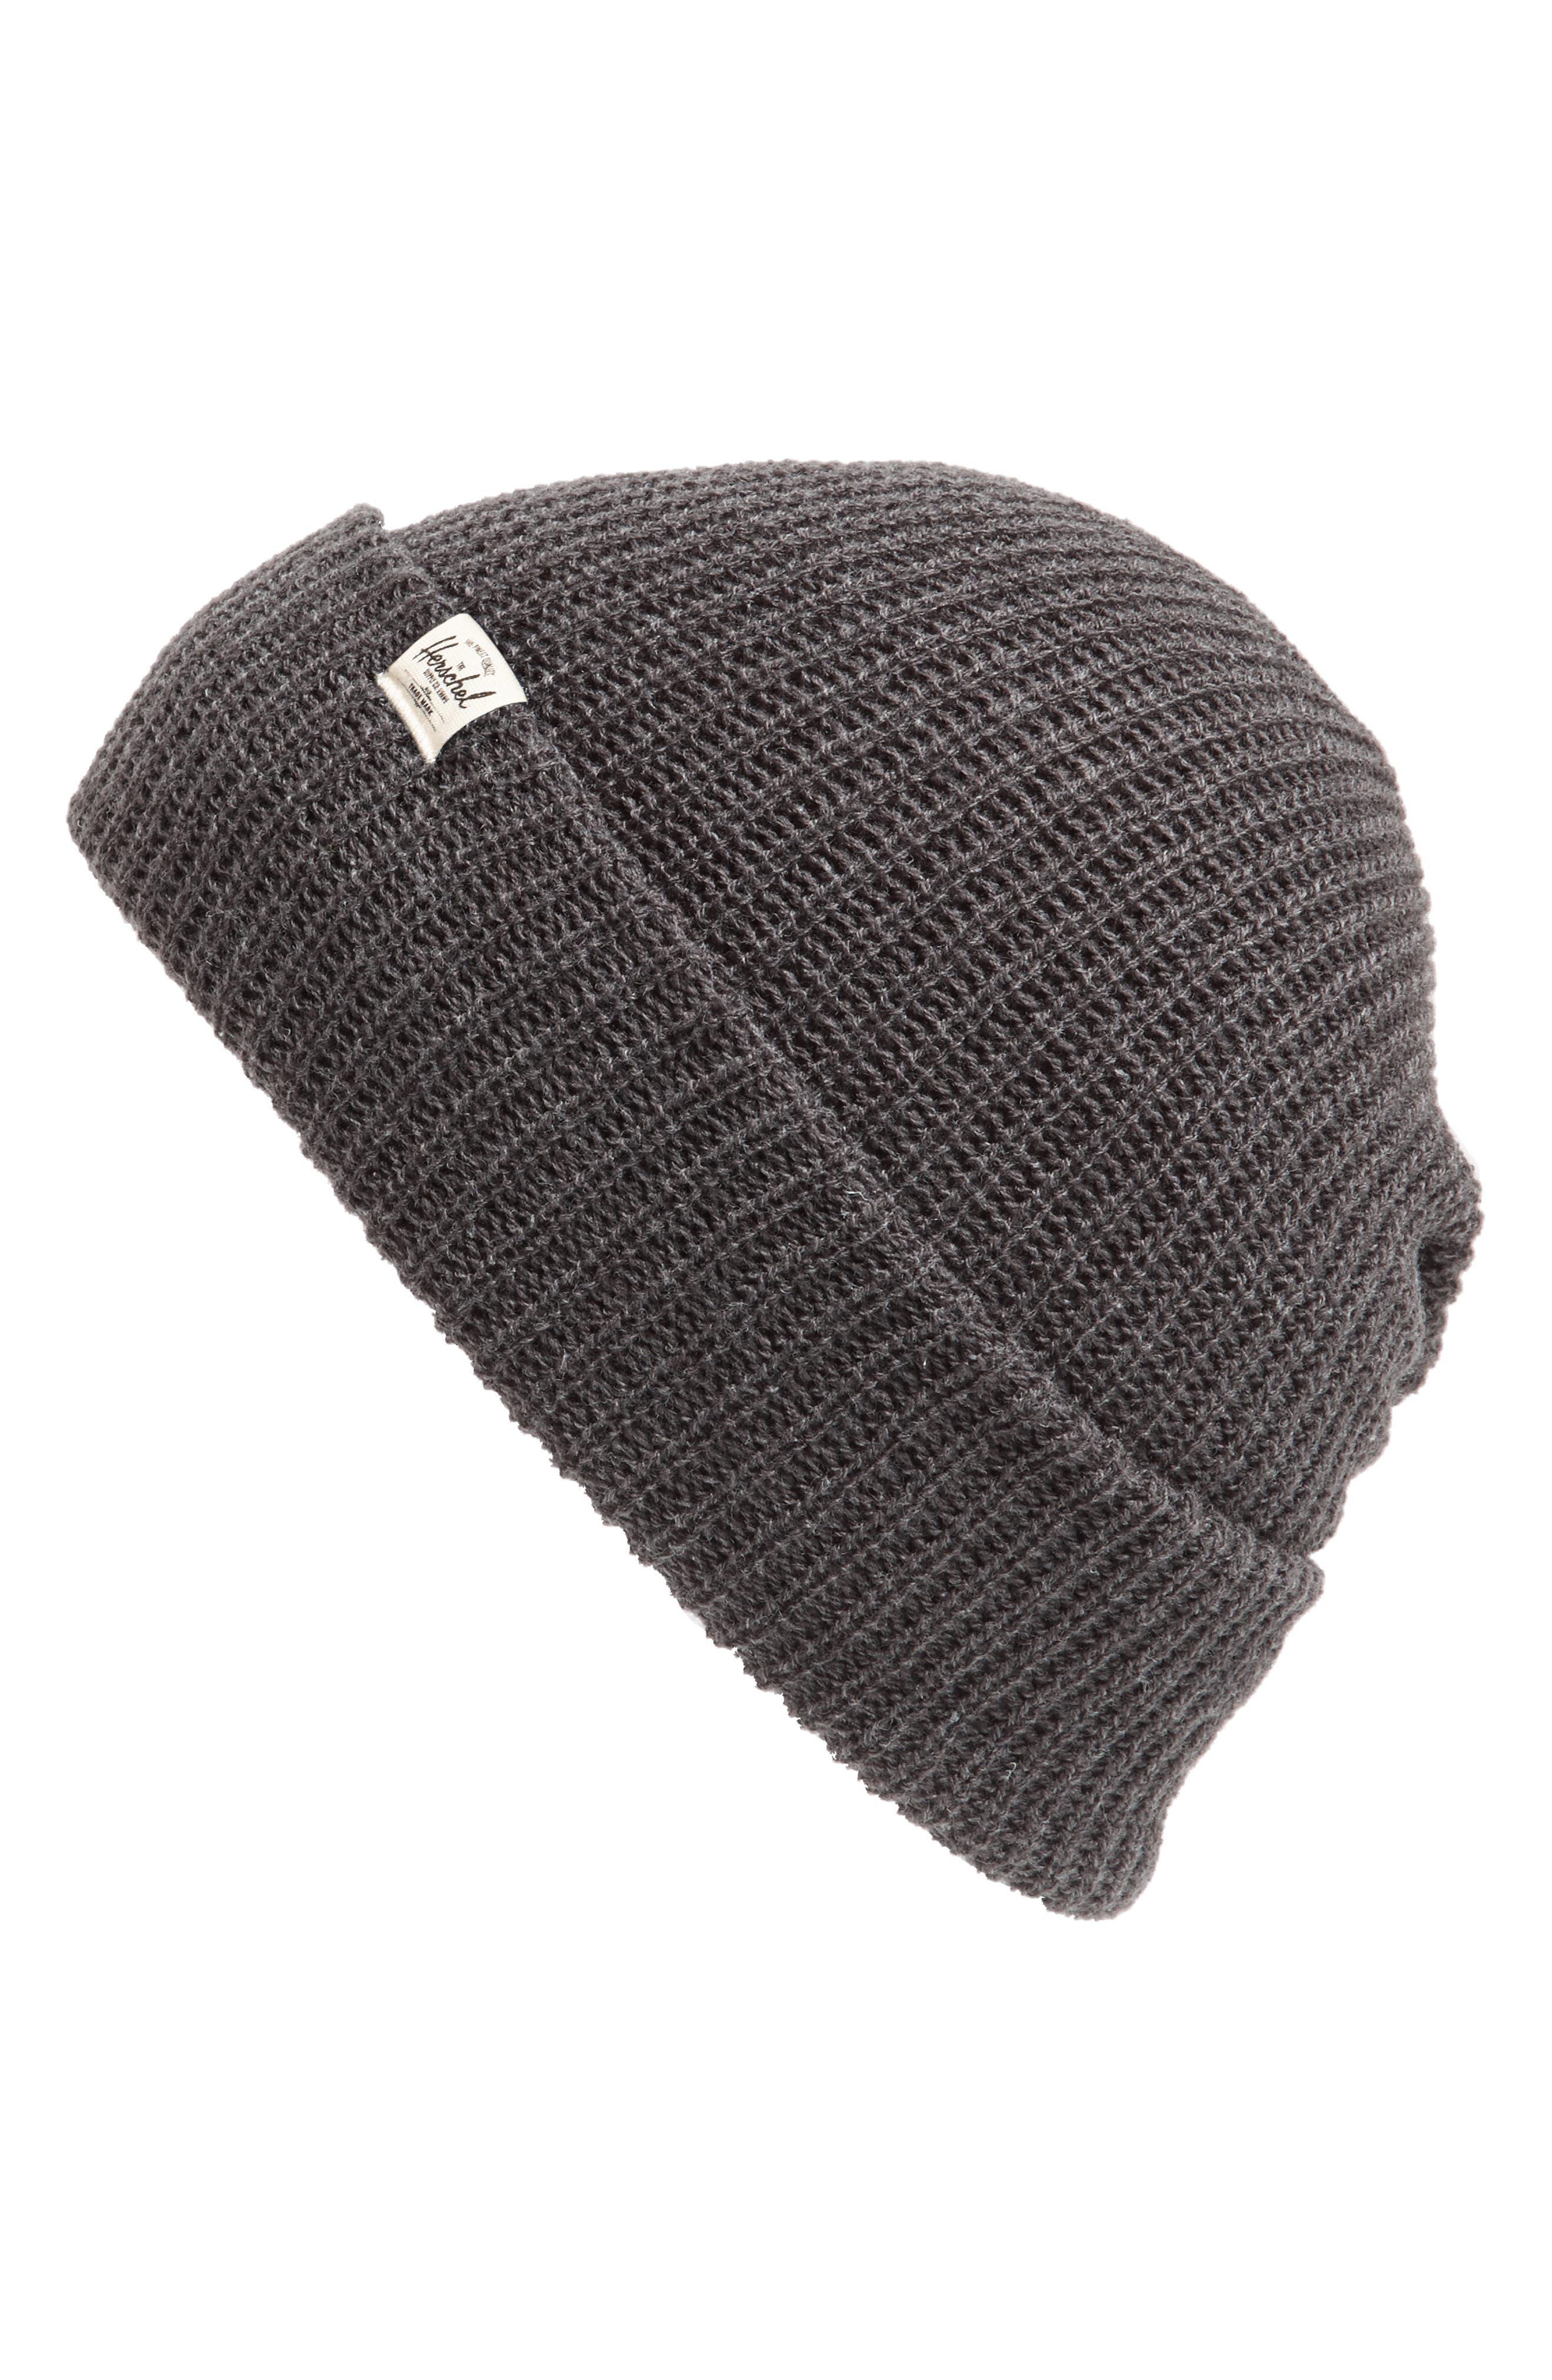 'Quartz' Solid Knit Cap,                             Alternate thumbnail 9, color,